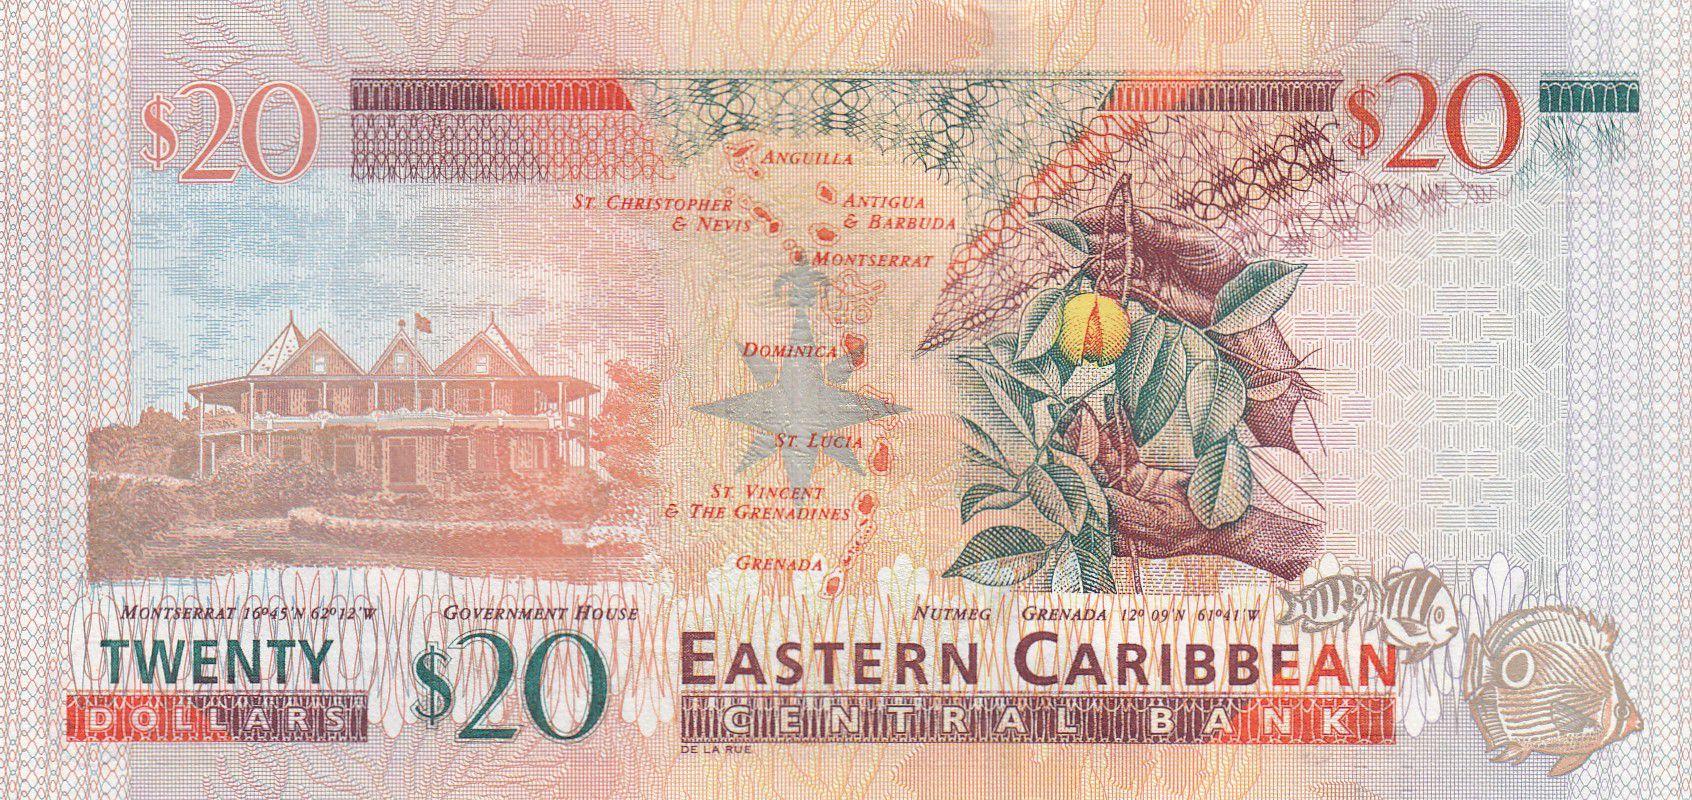 Iles des Caraïbes 20 Dollars Elisabeth II - 2015 - P.53b - Neuf